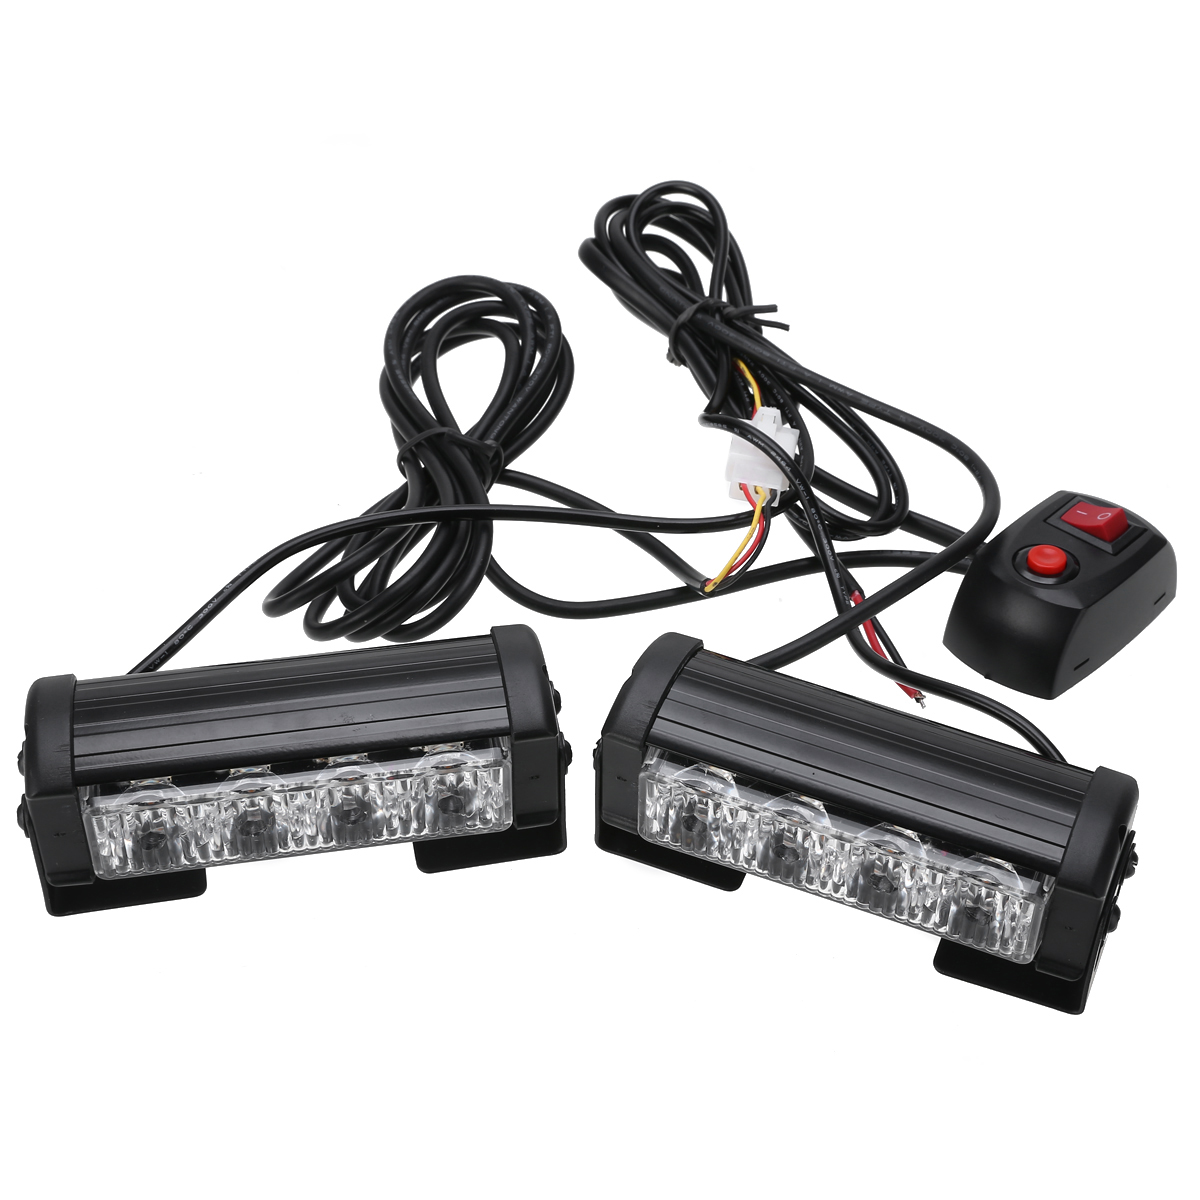 4 LED 4W Car Truck Strobe Flash Grille Light Warning Hazard Emergency Lamp Amber